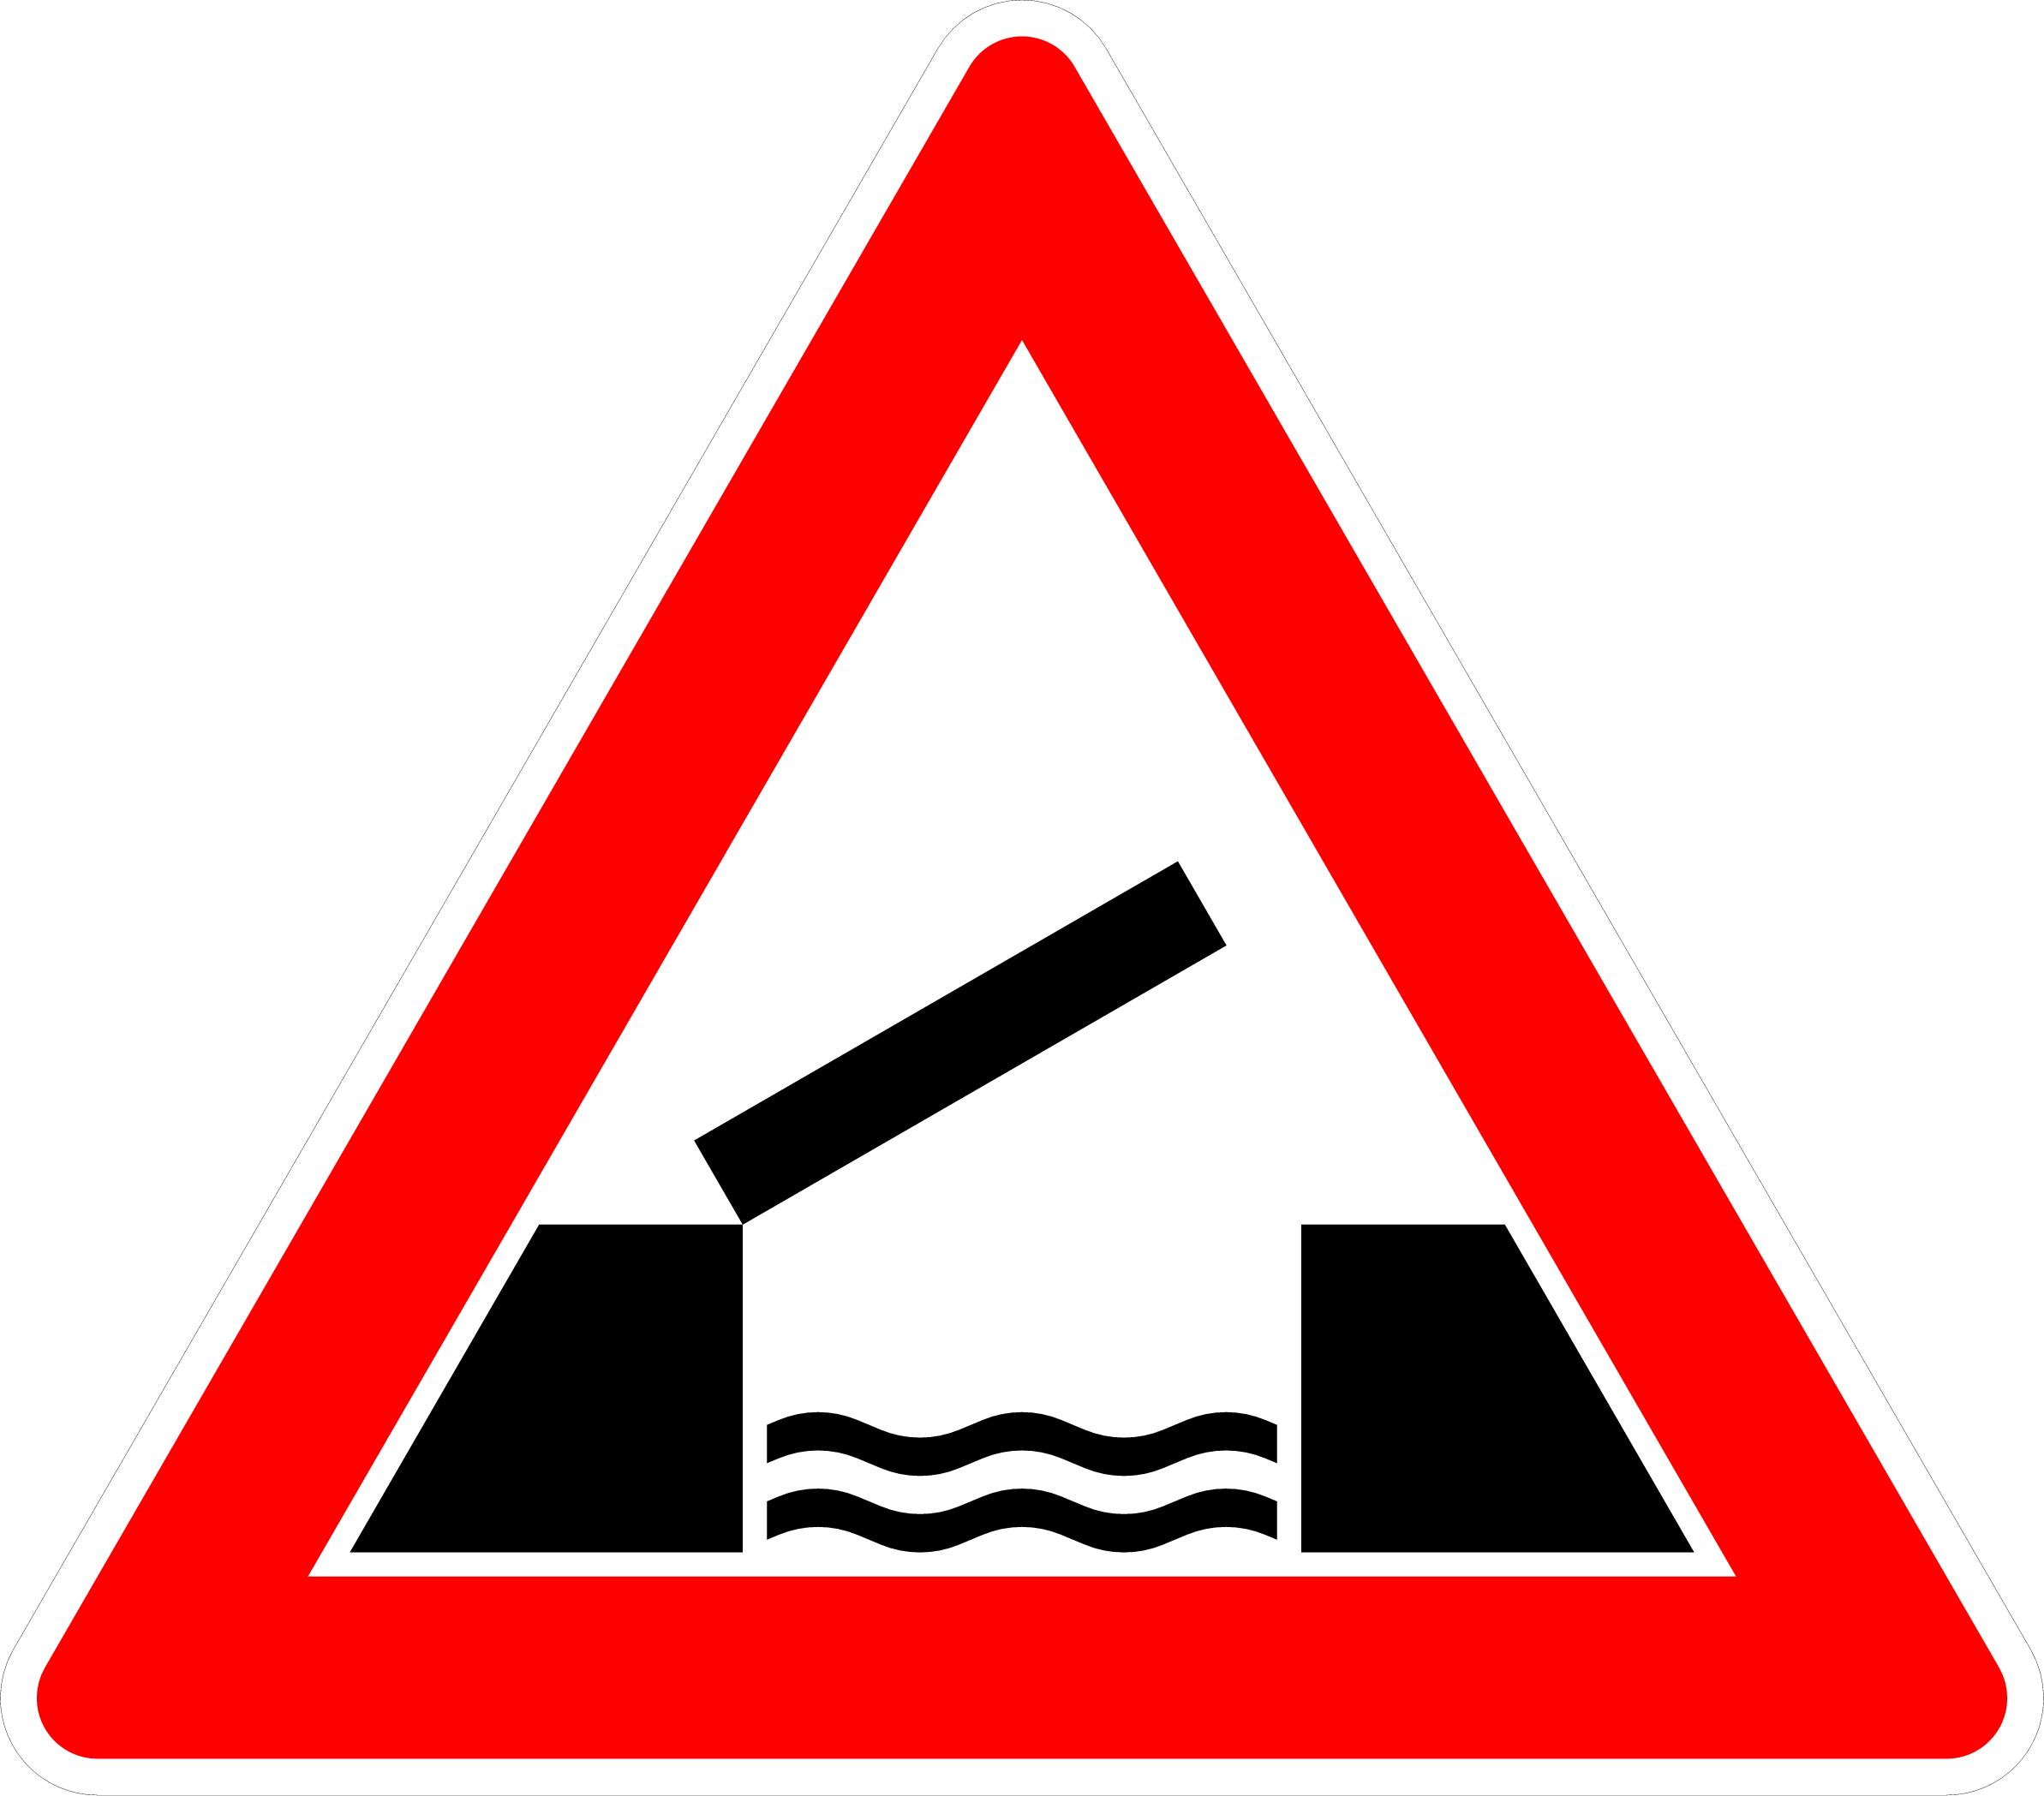 VZ 101-55 bewegliche Brücke